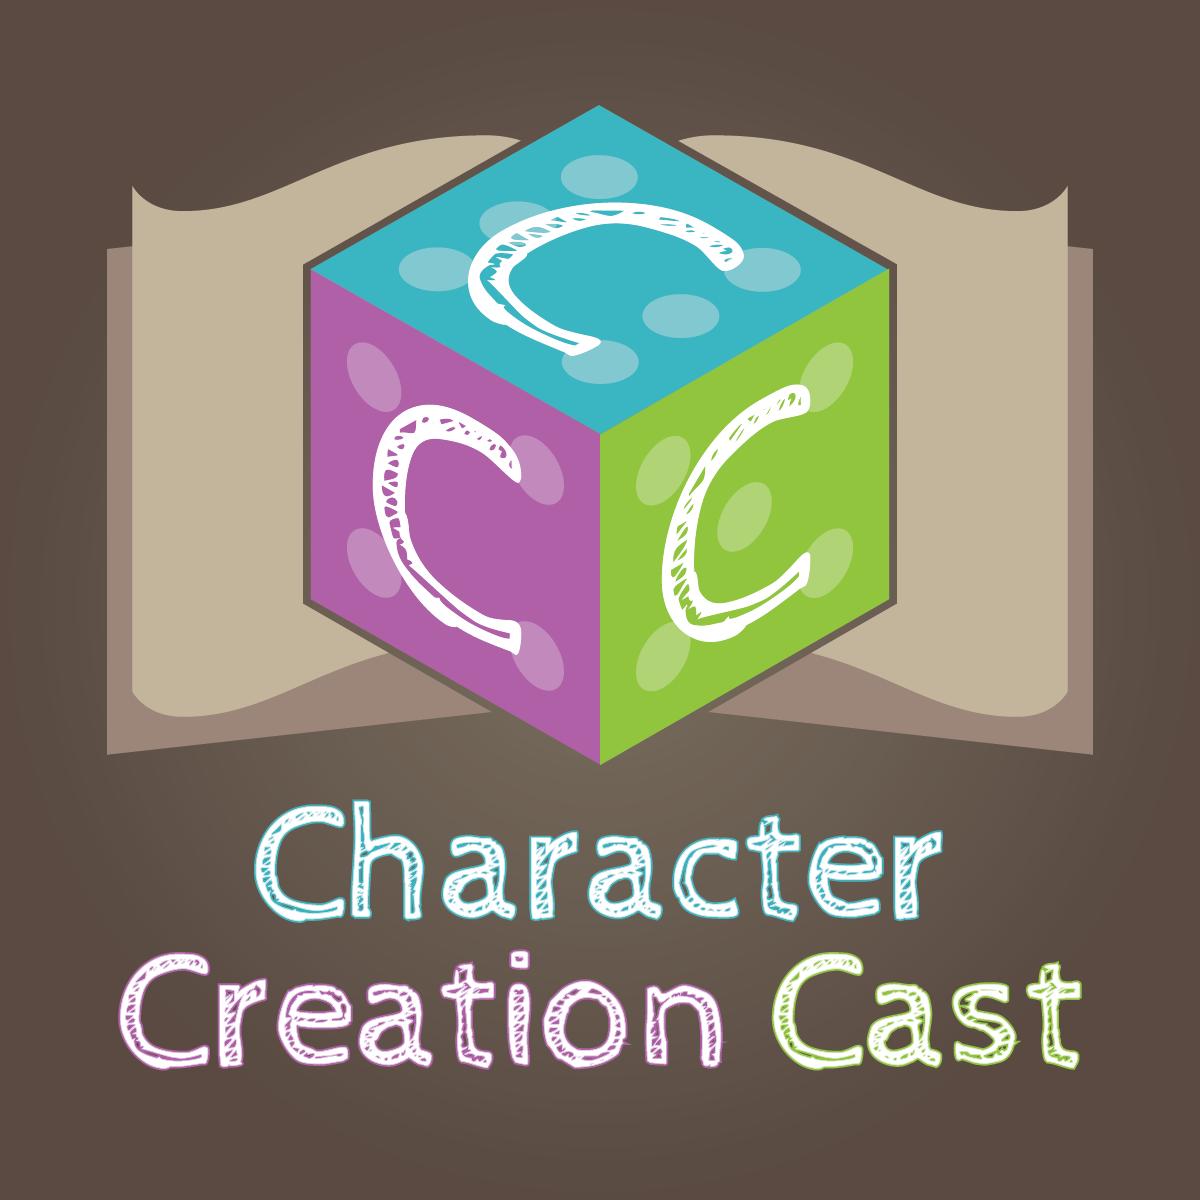 CharacterCreationCast_logo.png